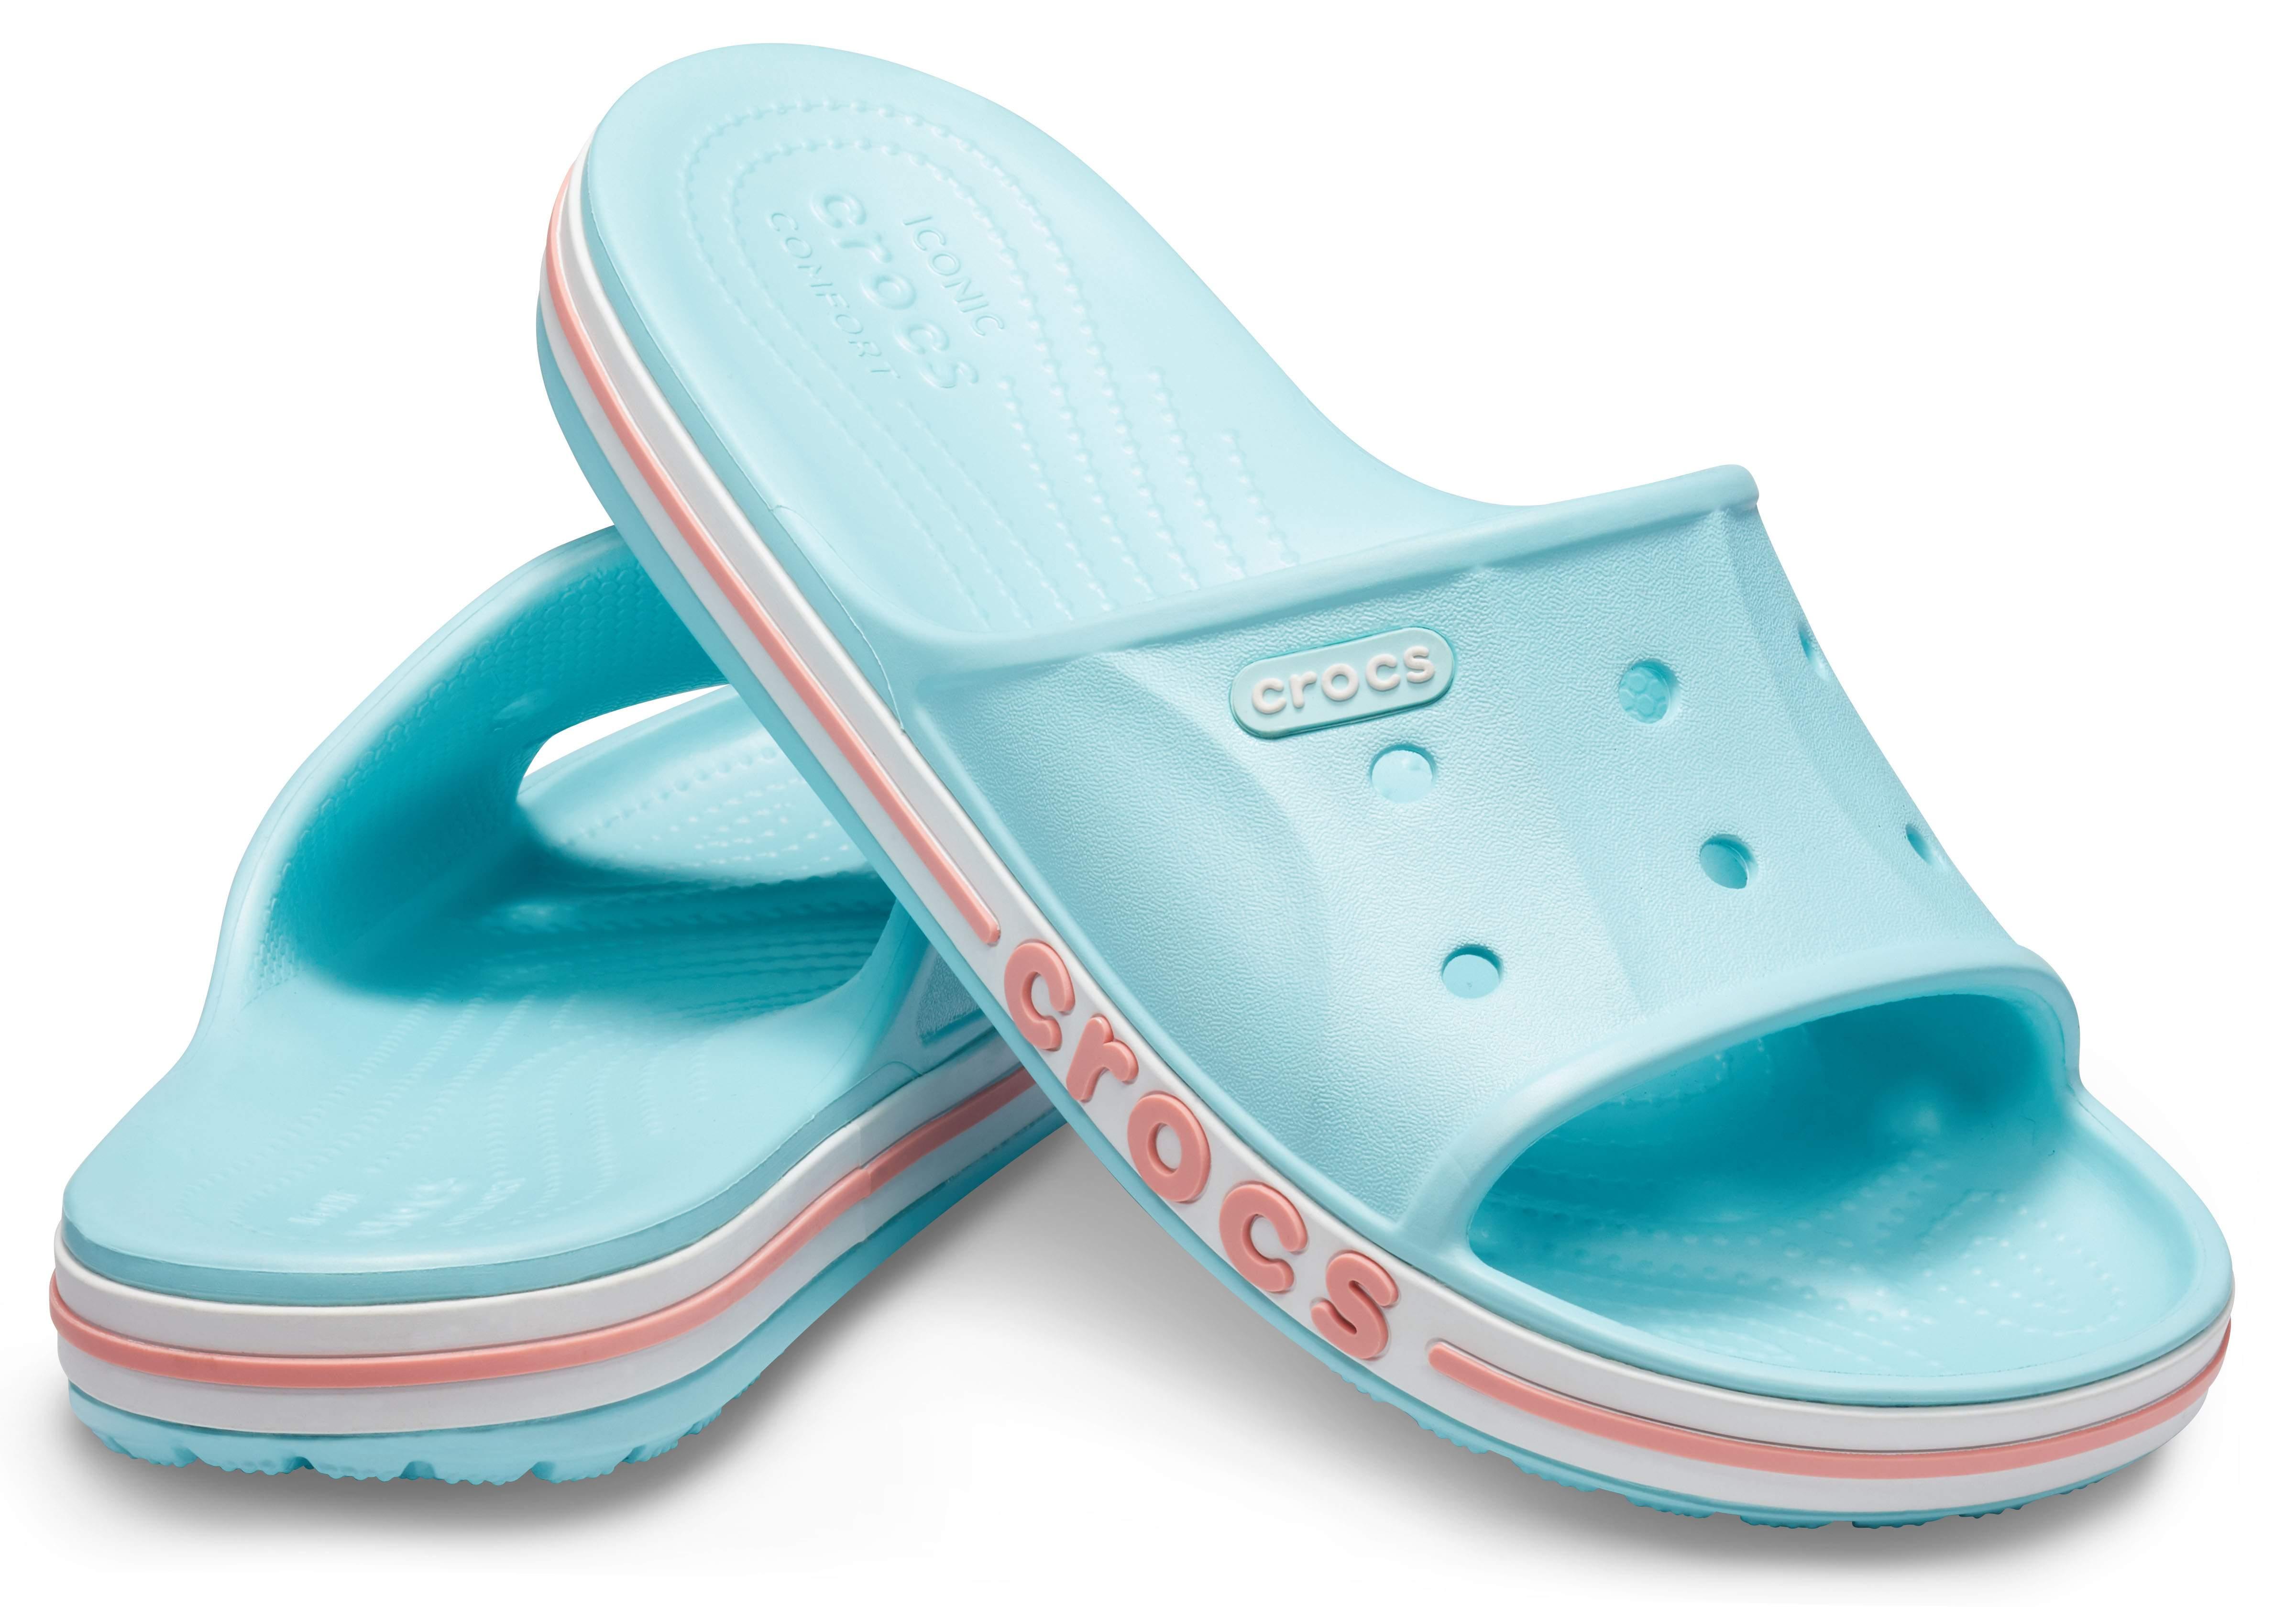 Image of Crocs Bayaband Slide Ice Blue / Melon 205392-4JF